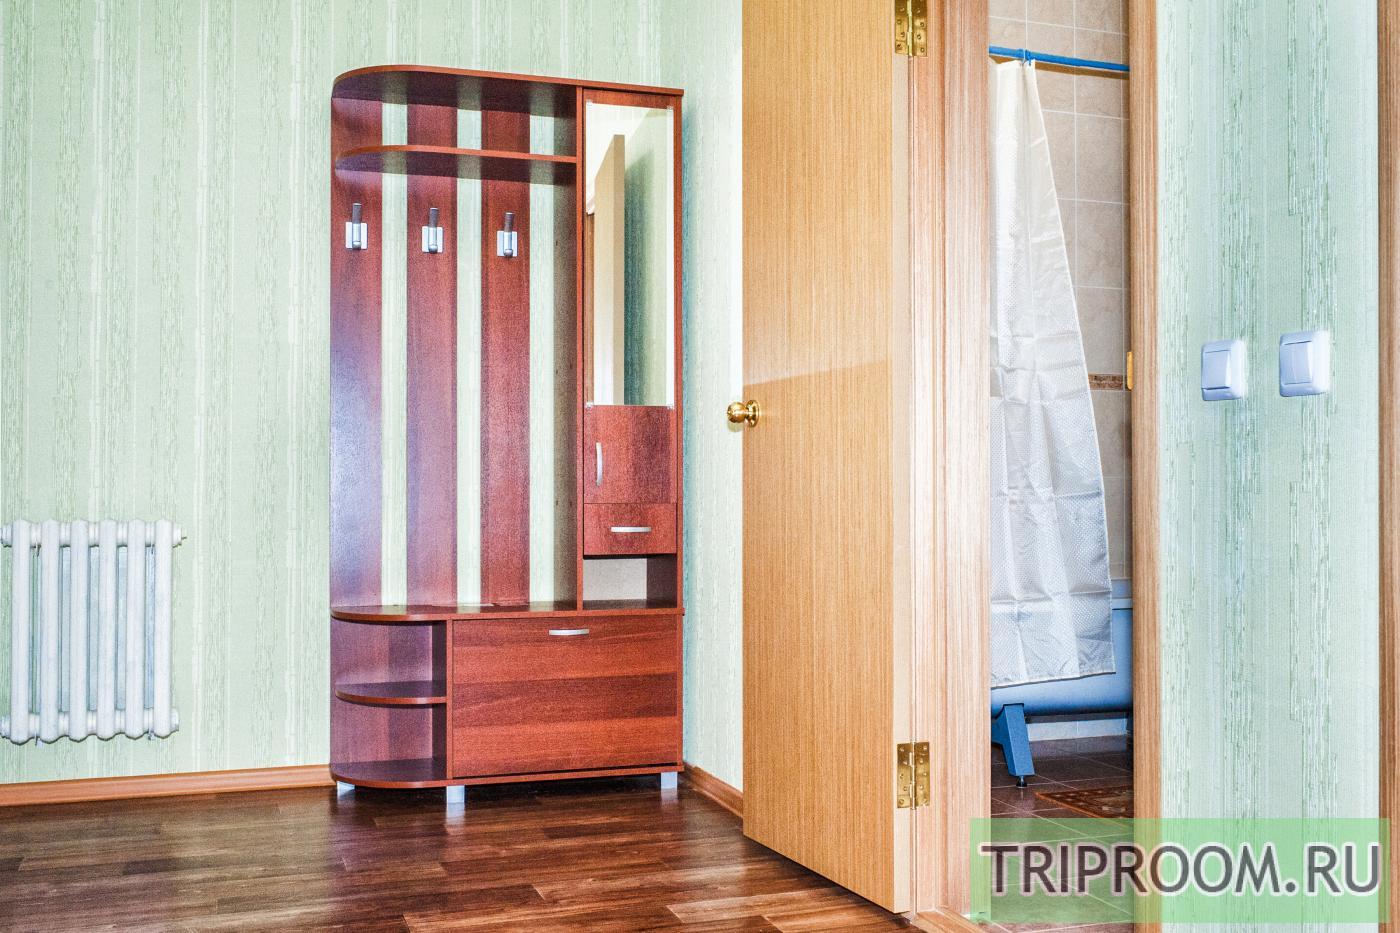 1-комнатная квартира посуточно (вариант № 11815), ул. Петра Смородина улица, фото № 7